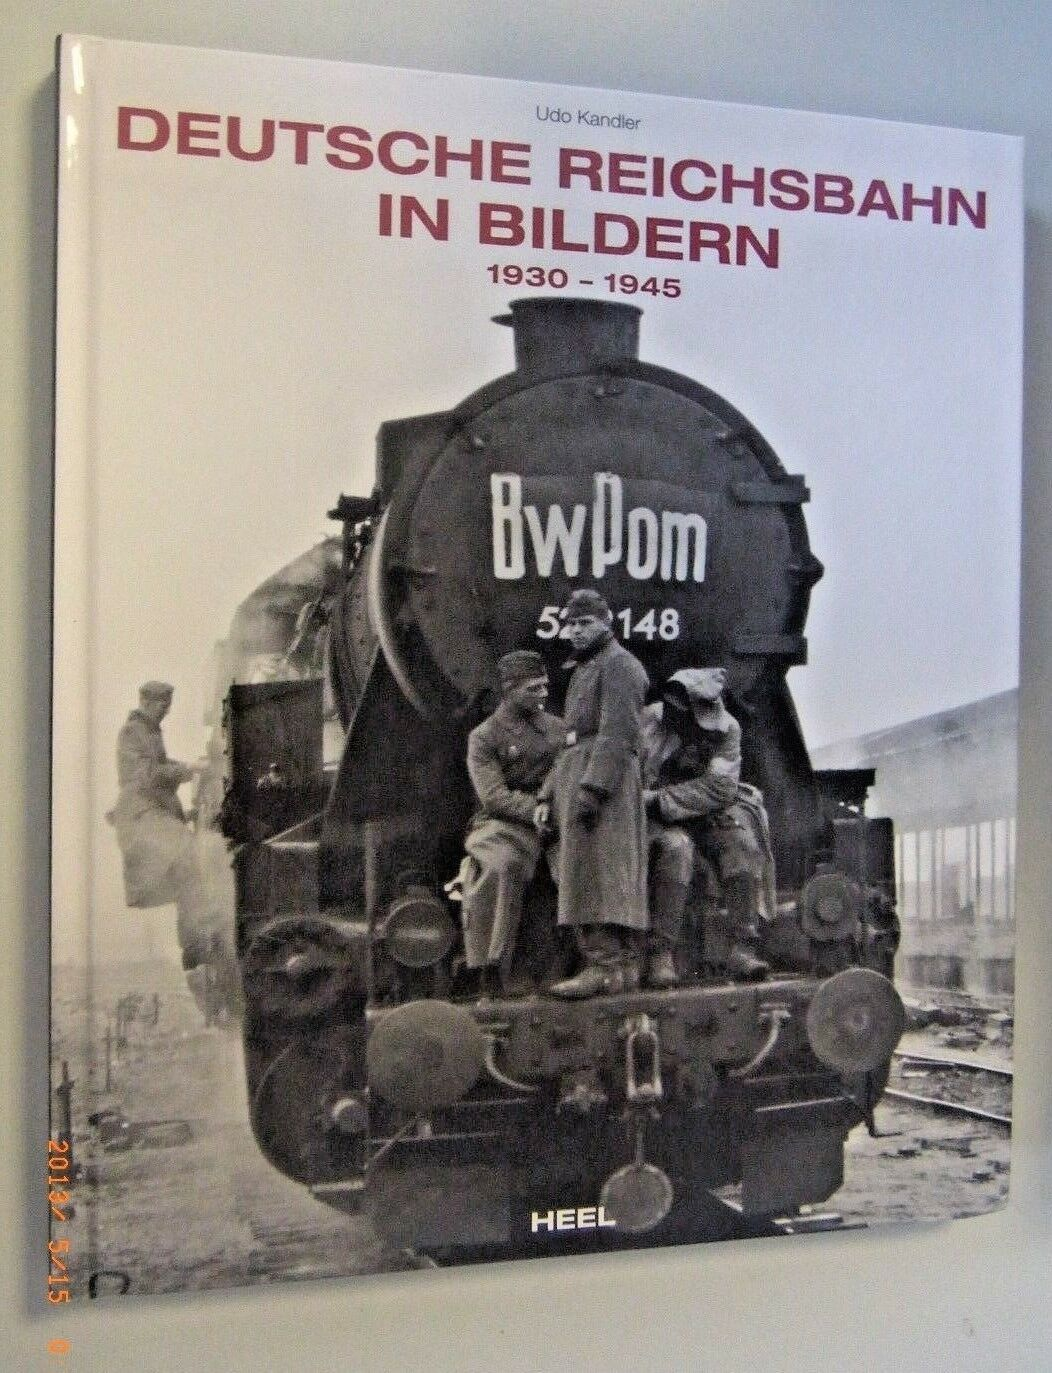 Deutsche Reichsbahn in in in Immagini 1930-1945  Udo Keler a754e4